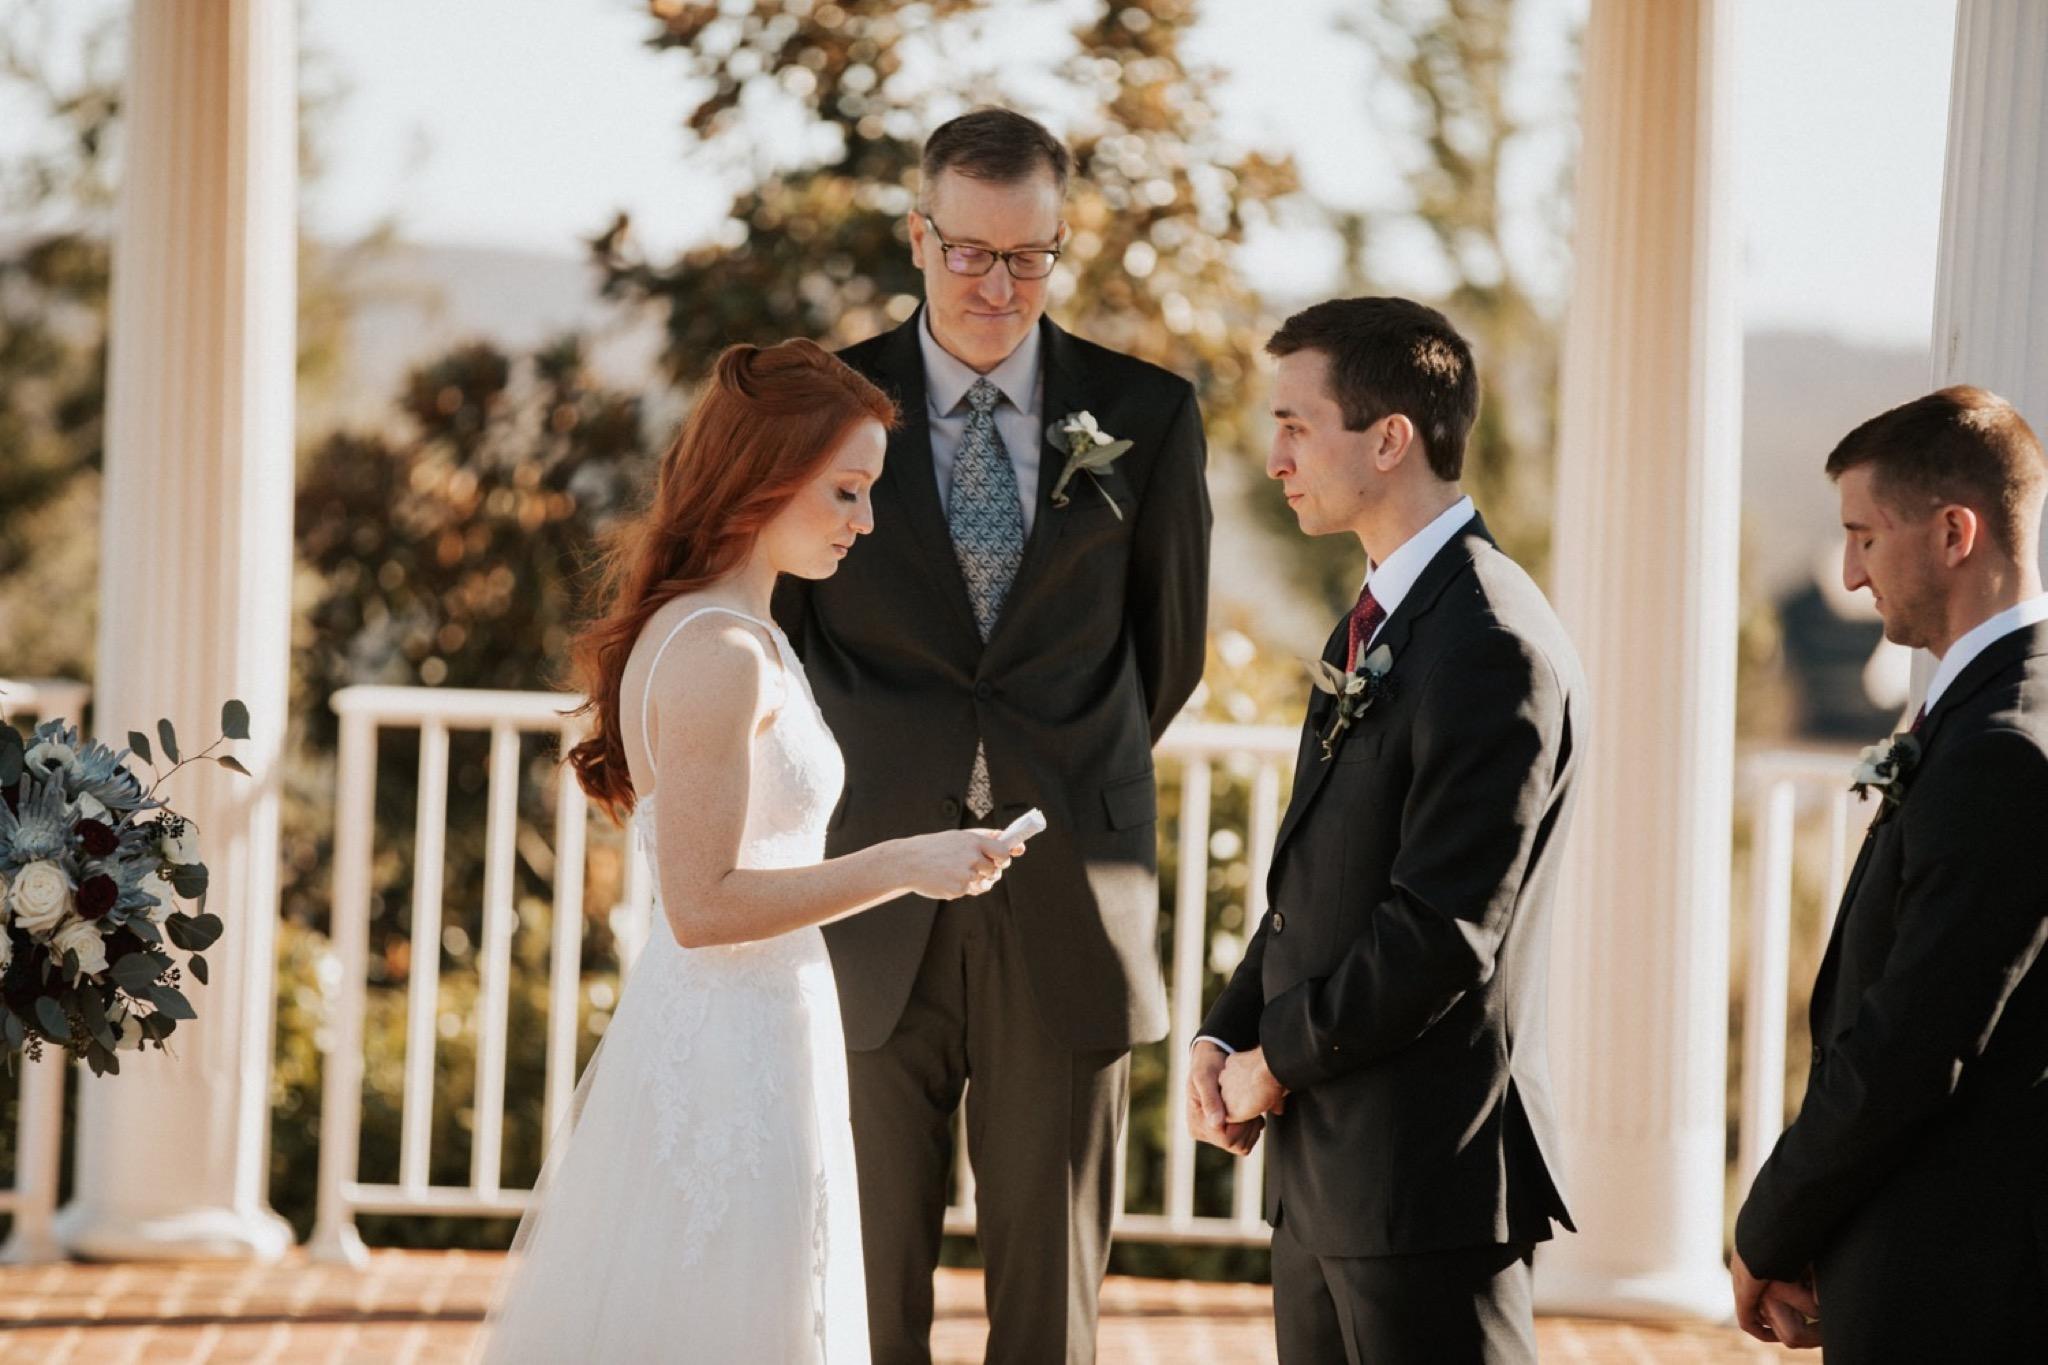 47_West Manor Estate Weddings - Pat Cori Photography-101_Ceremony_VirginiaWeddingPhotographer_PatCoriPhotography_WestManorEstate_Wedding.jpg